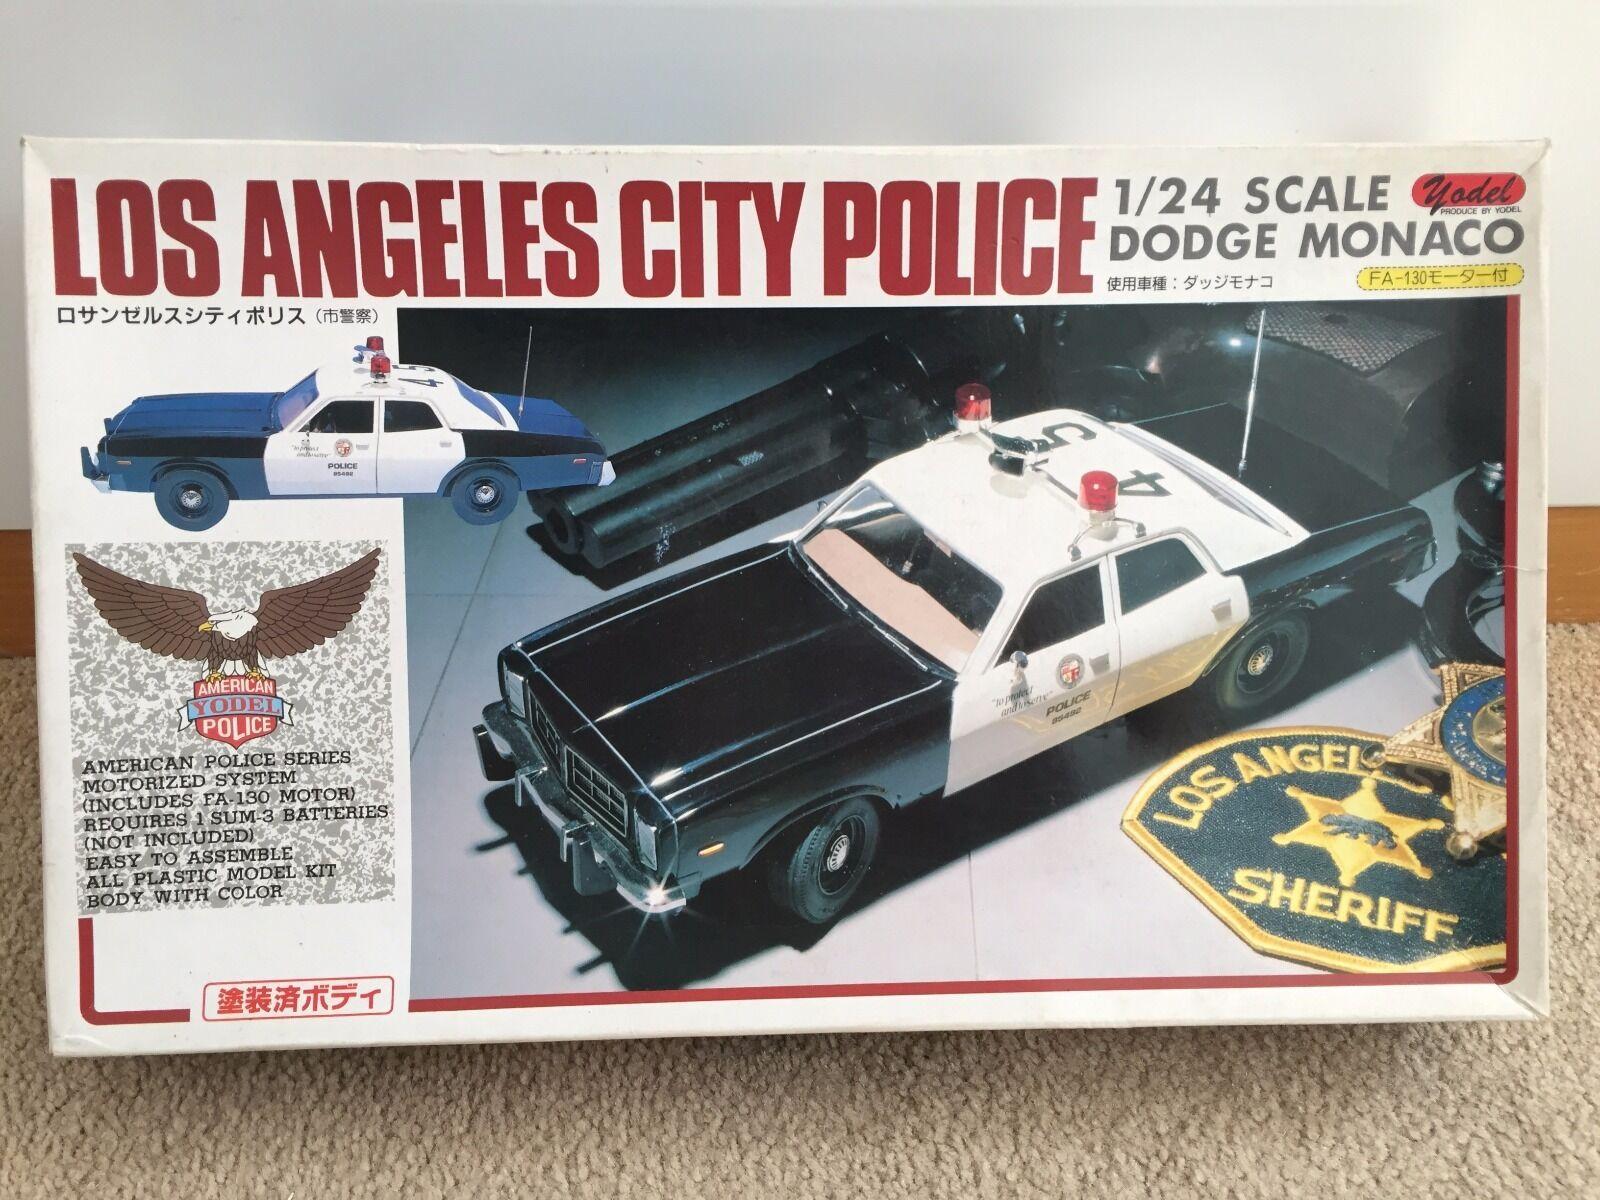 1 24 Yodel Dodge Monaco L.A. City Police